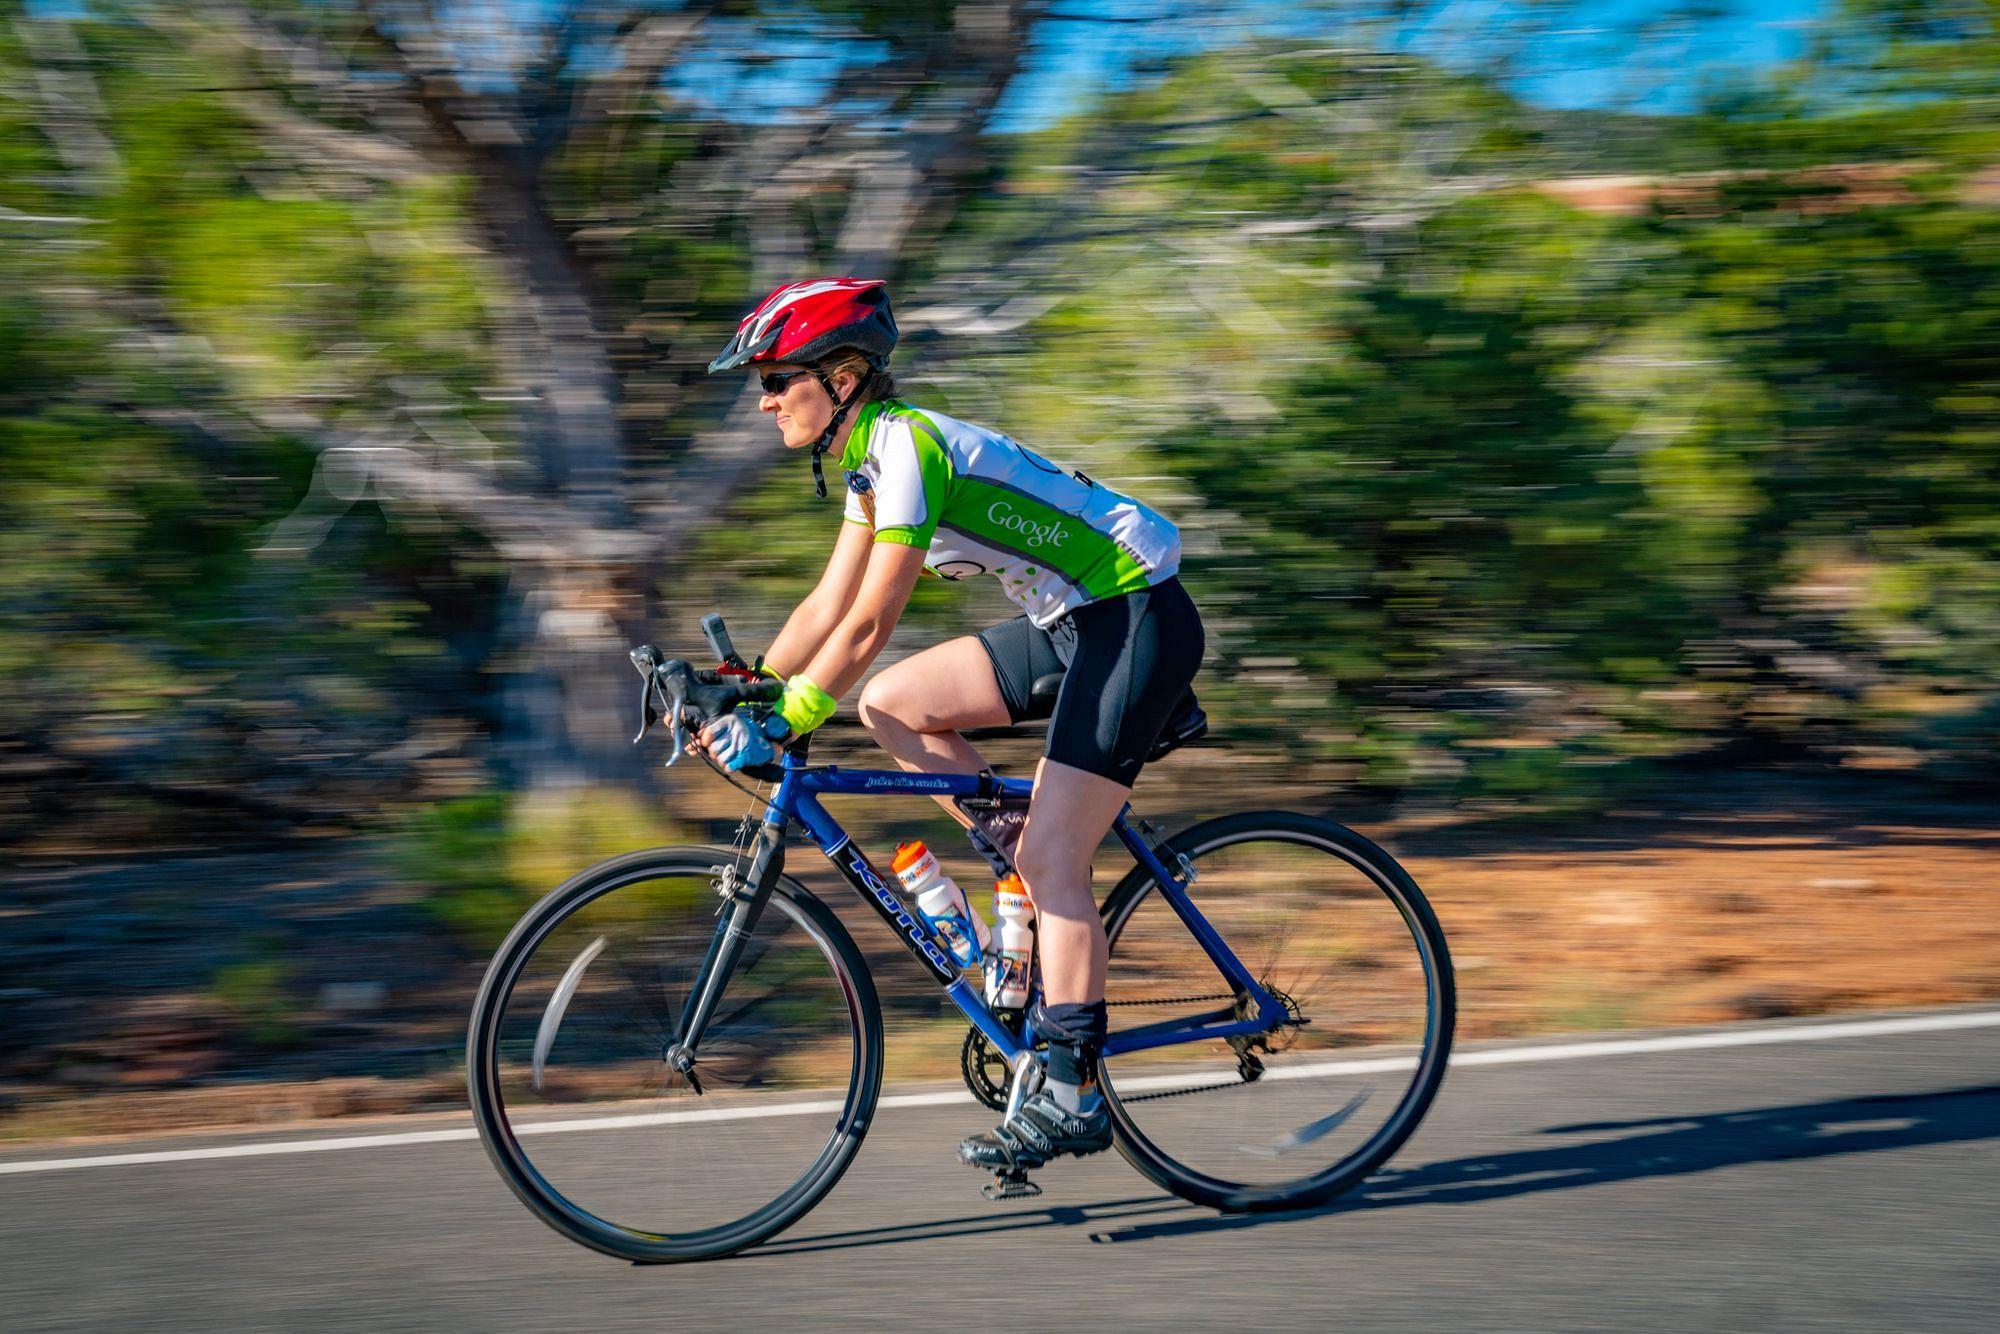 Cycling Rim Rock Drive